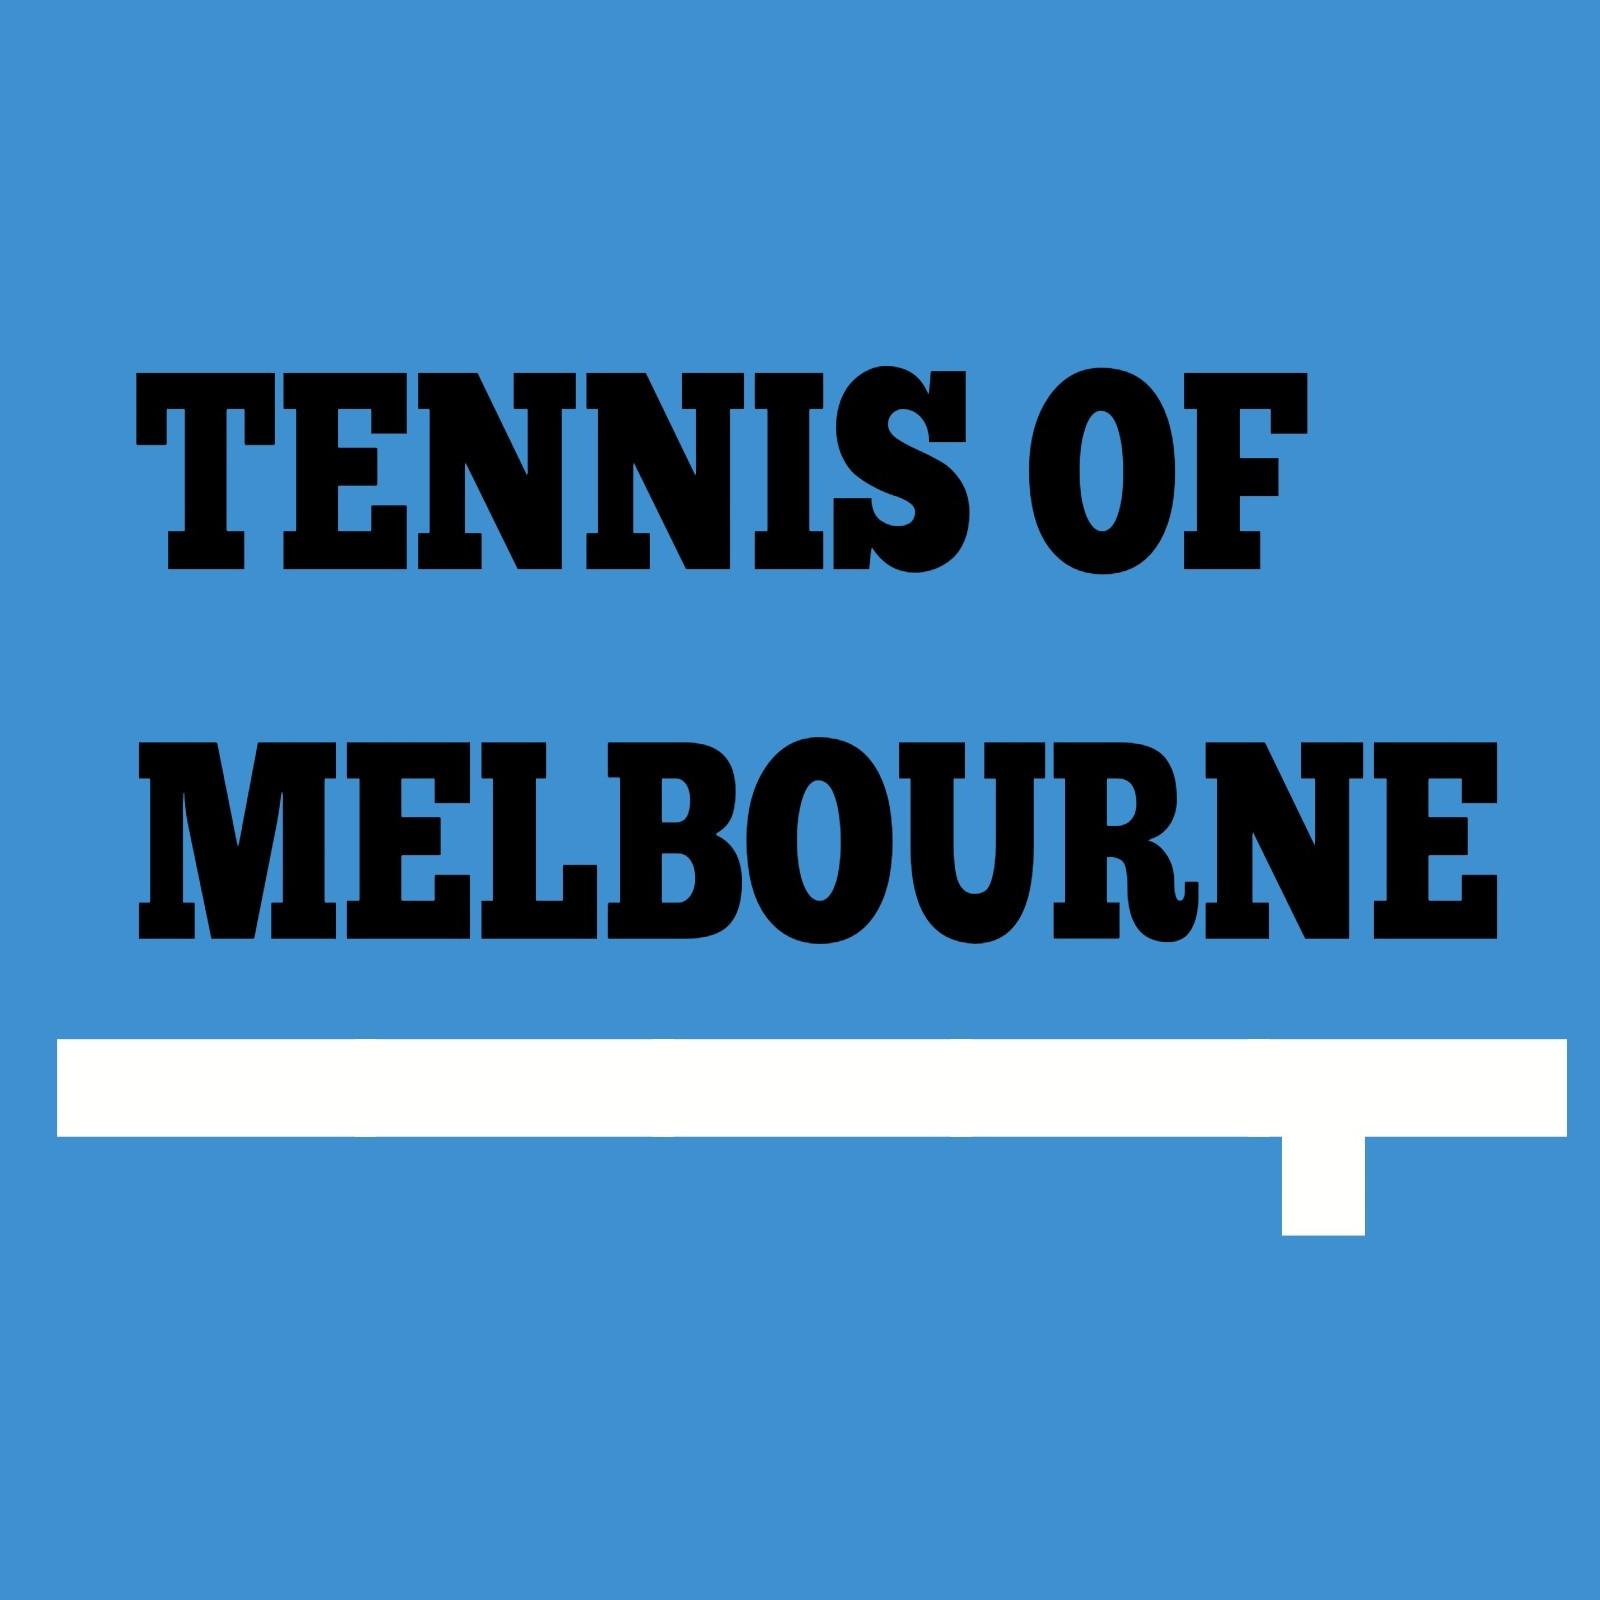 Tennis of Melbourne